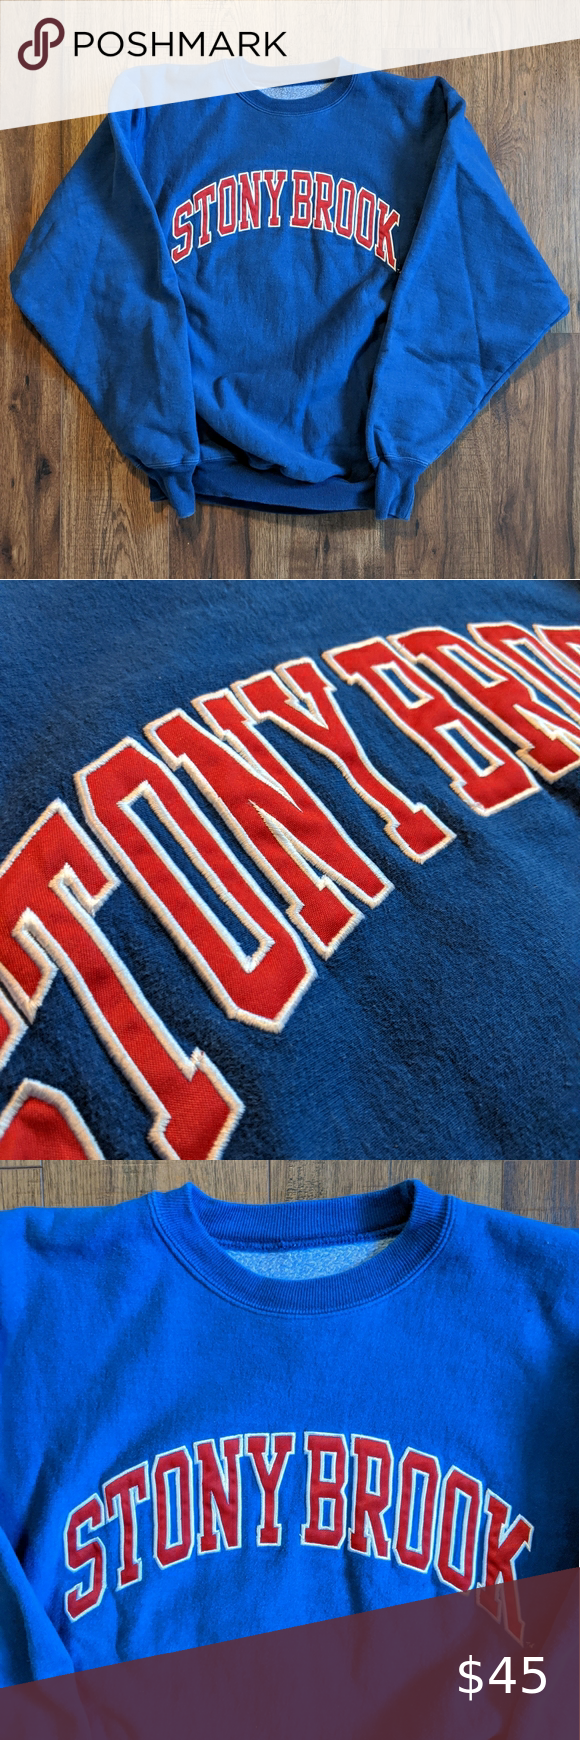 Vintage Stony Brook Crewneck Sweatshirt Crew Neck Sweatshirt Vintage Sweatshirt Sweatshirts [ 1740 x 580 Pixel ]